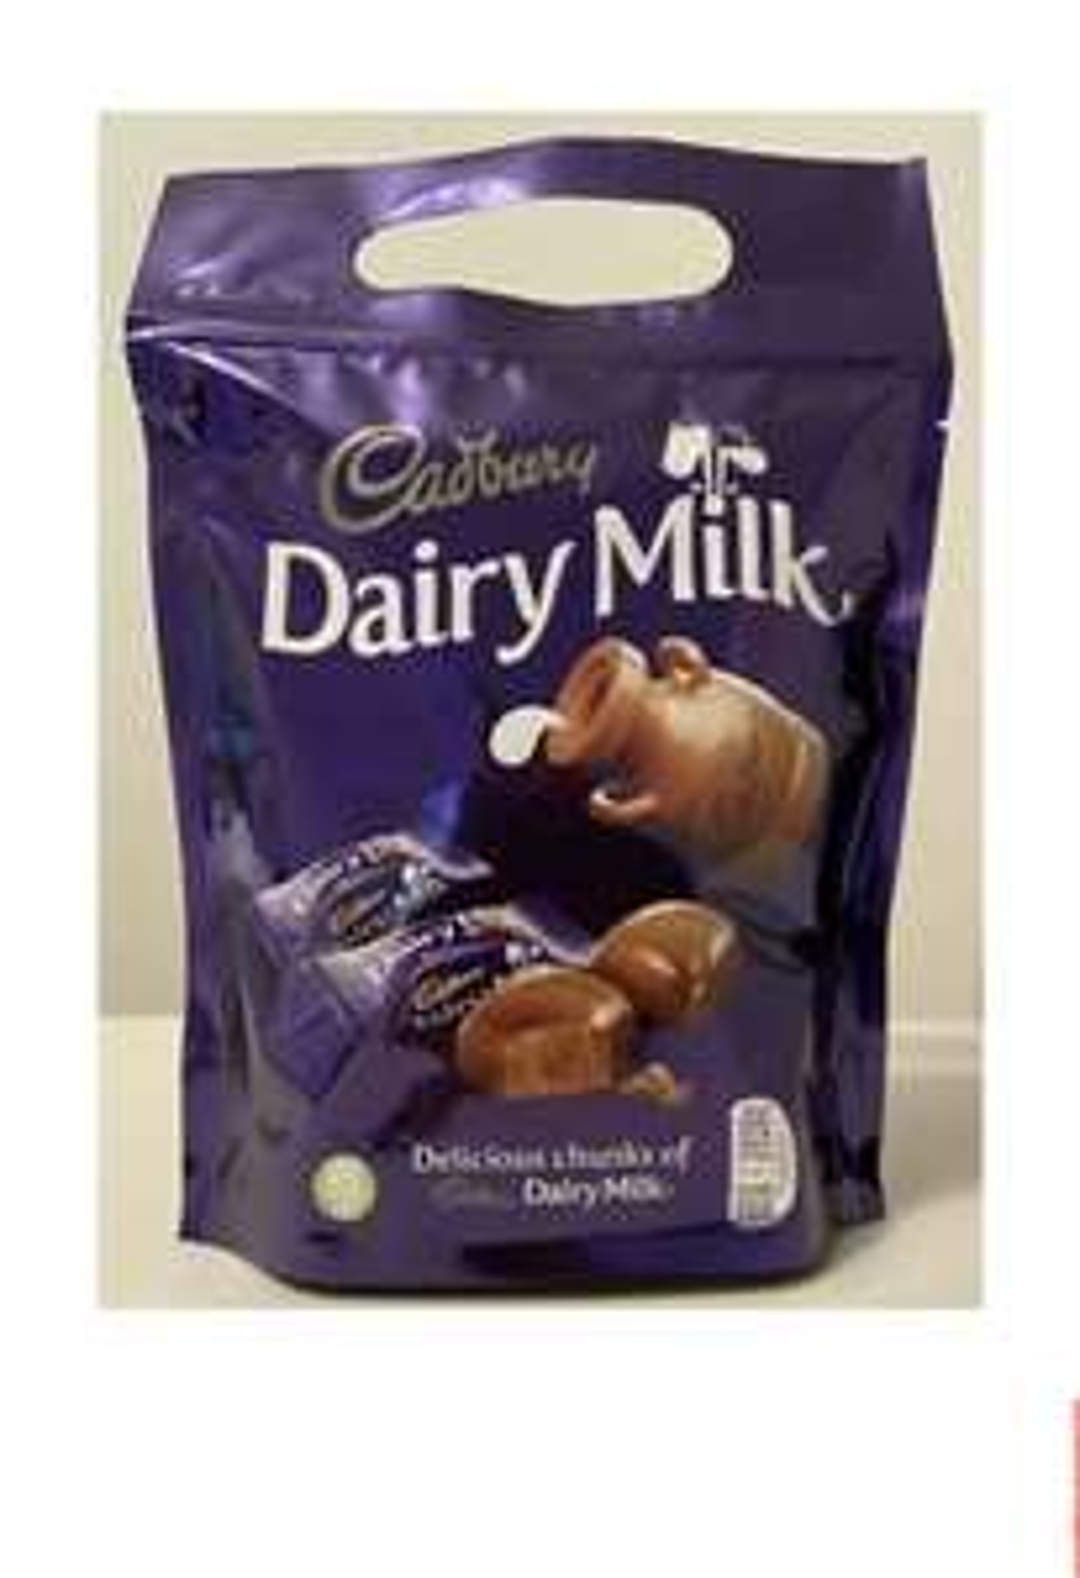 Dairy milk pouch bag - £2 instore at Tesco (Warrington)